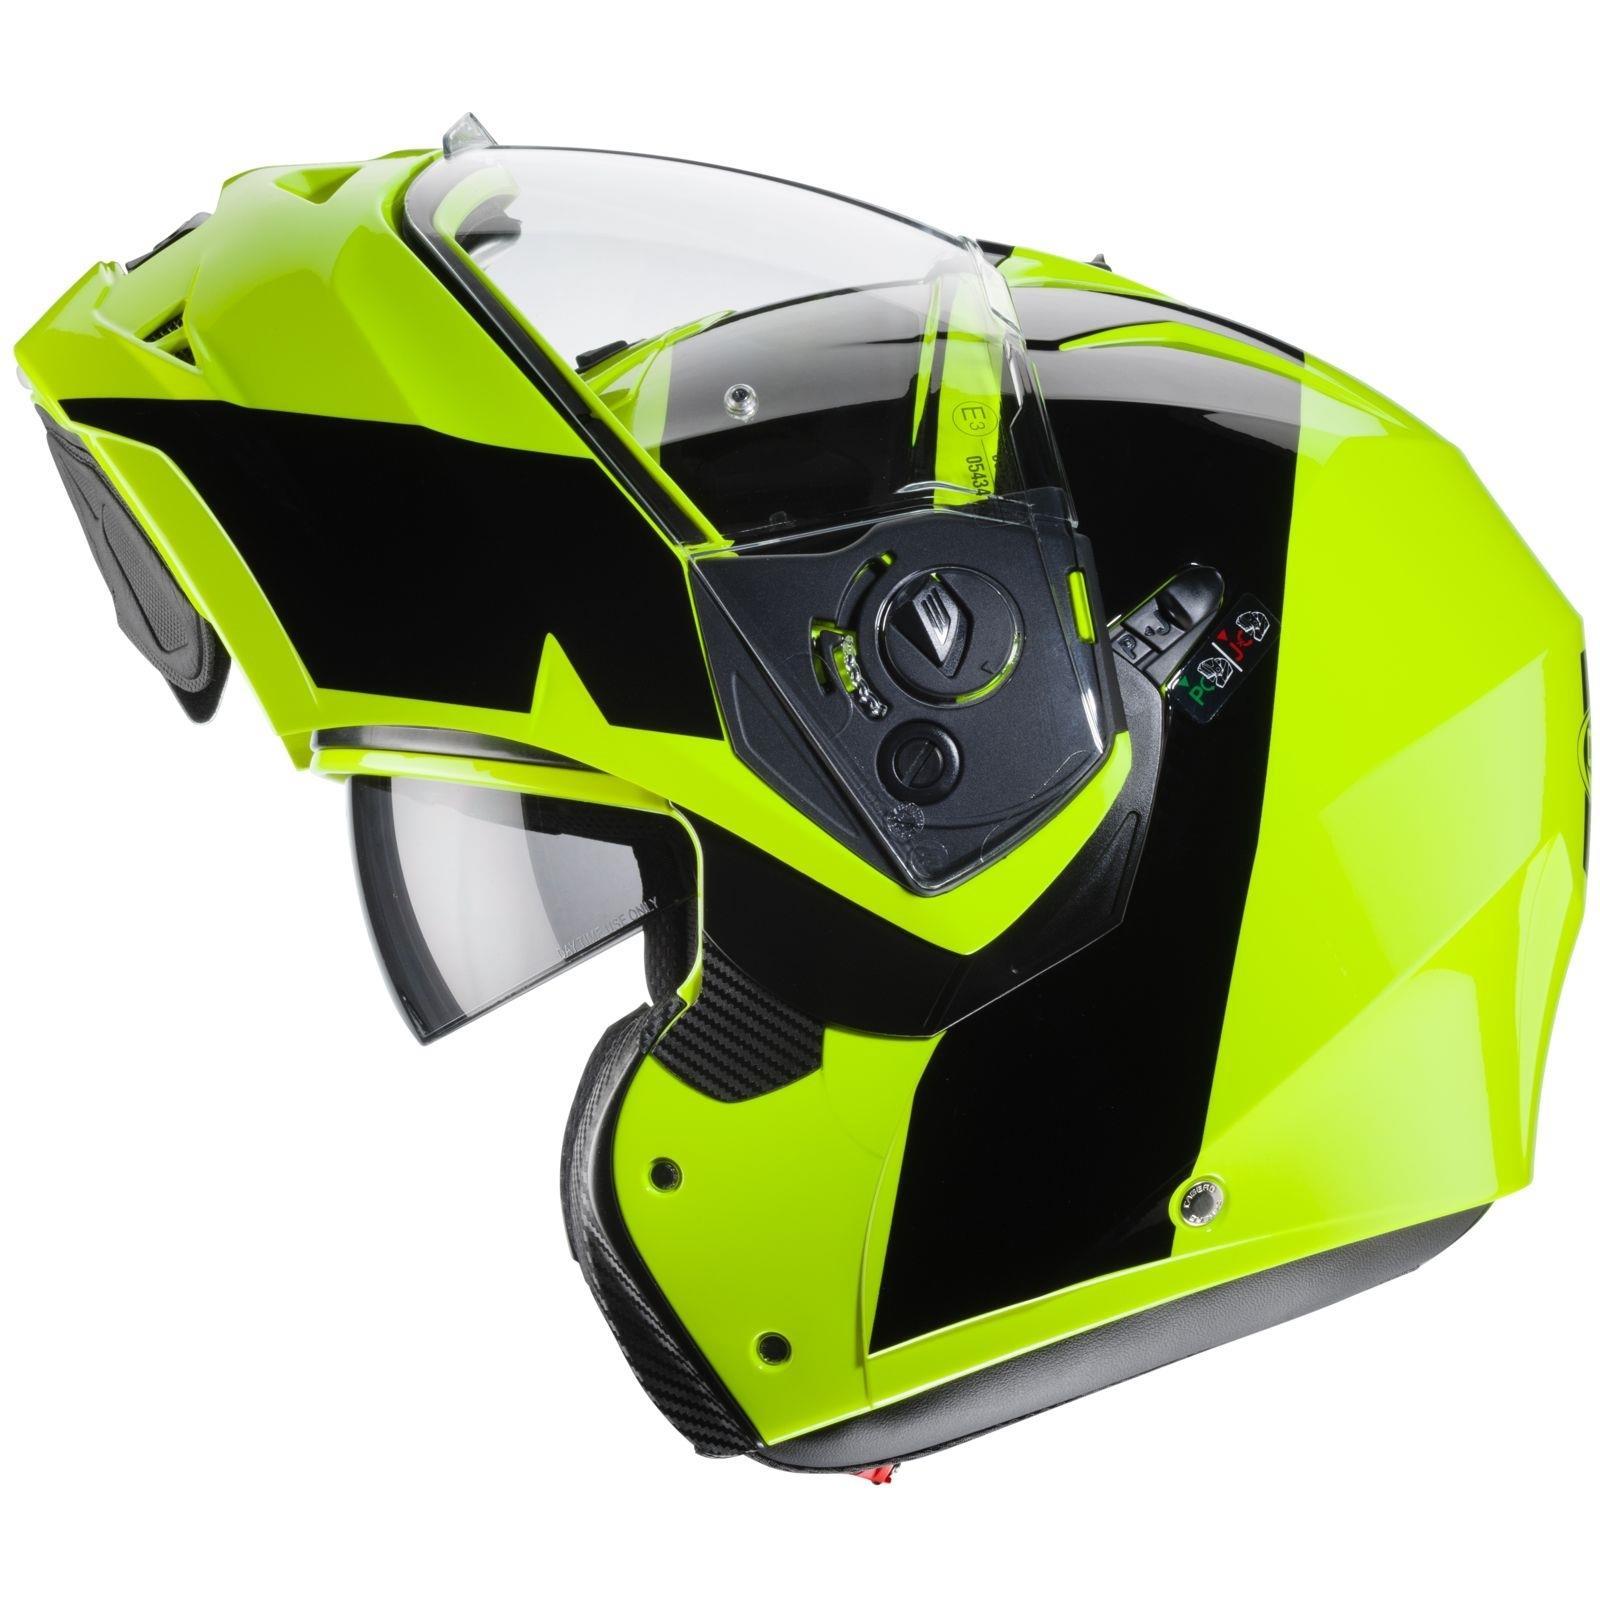 Caberg-Klapp-Helm-Duke-II-2-Motorrad-Belueftet-Sonnenblende-Pinlock-Visier-Jet Indexbild 38